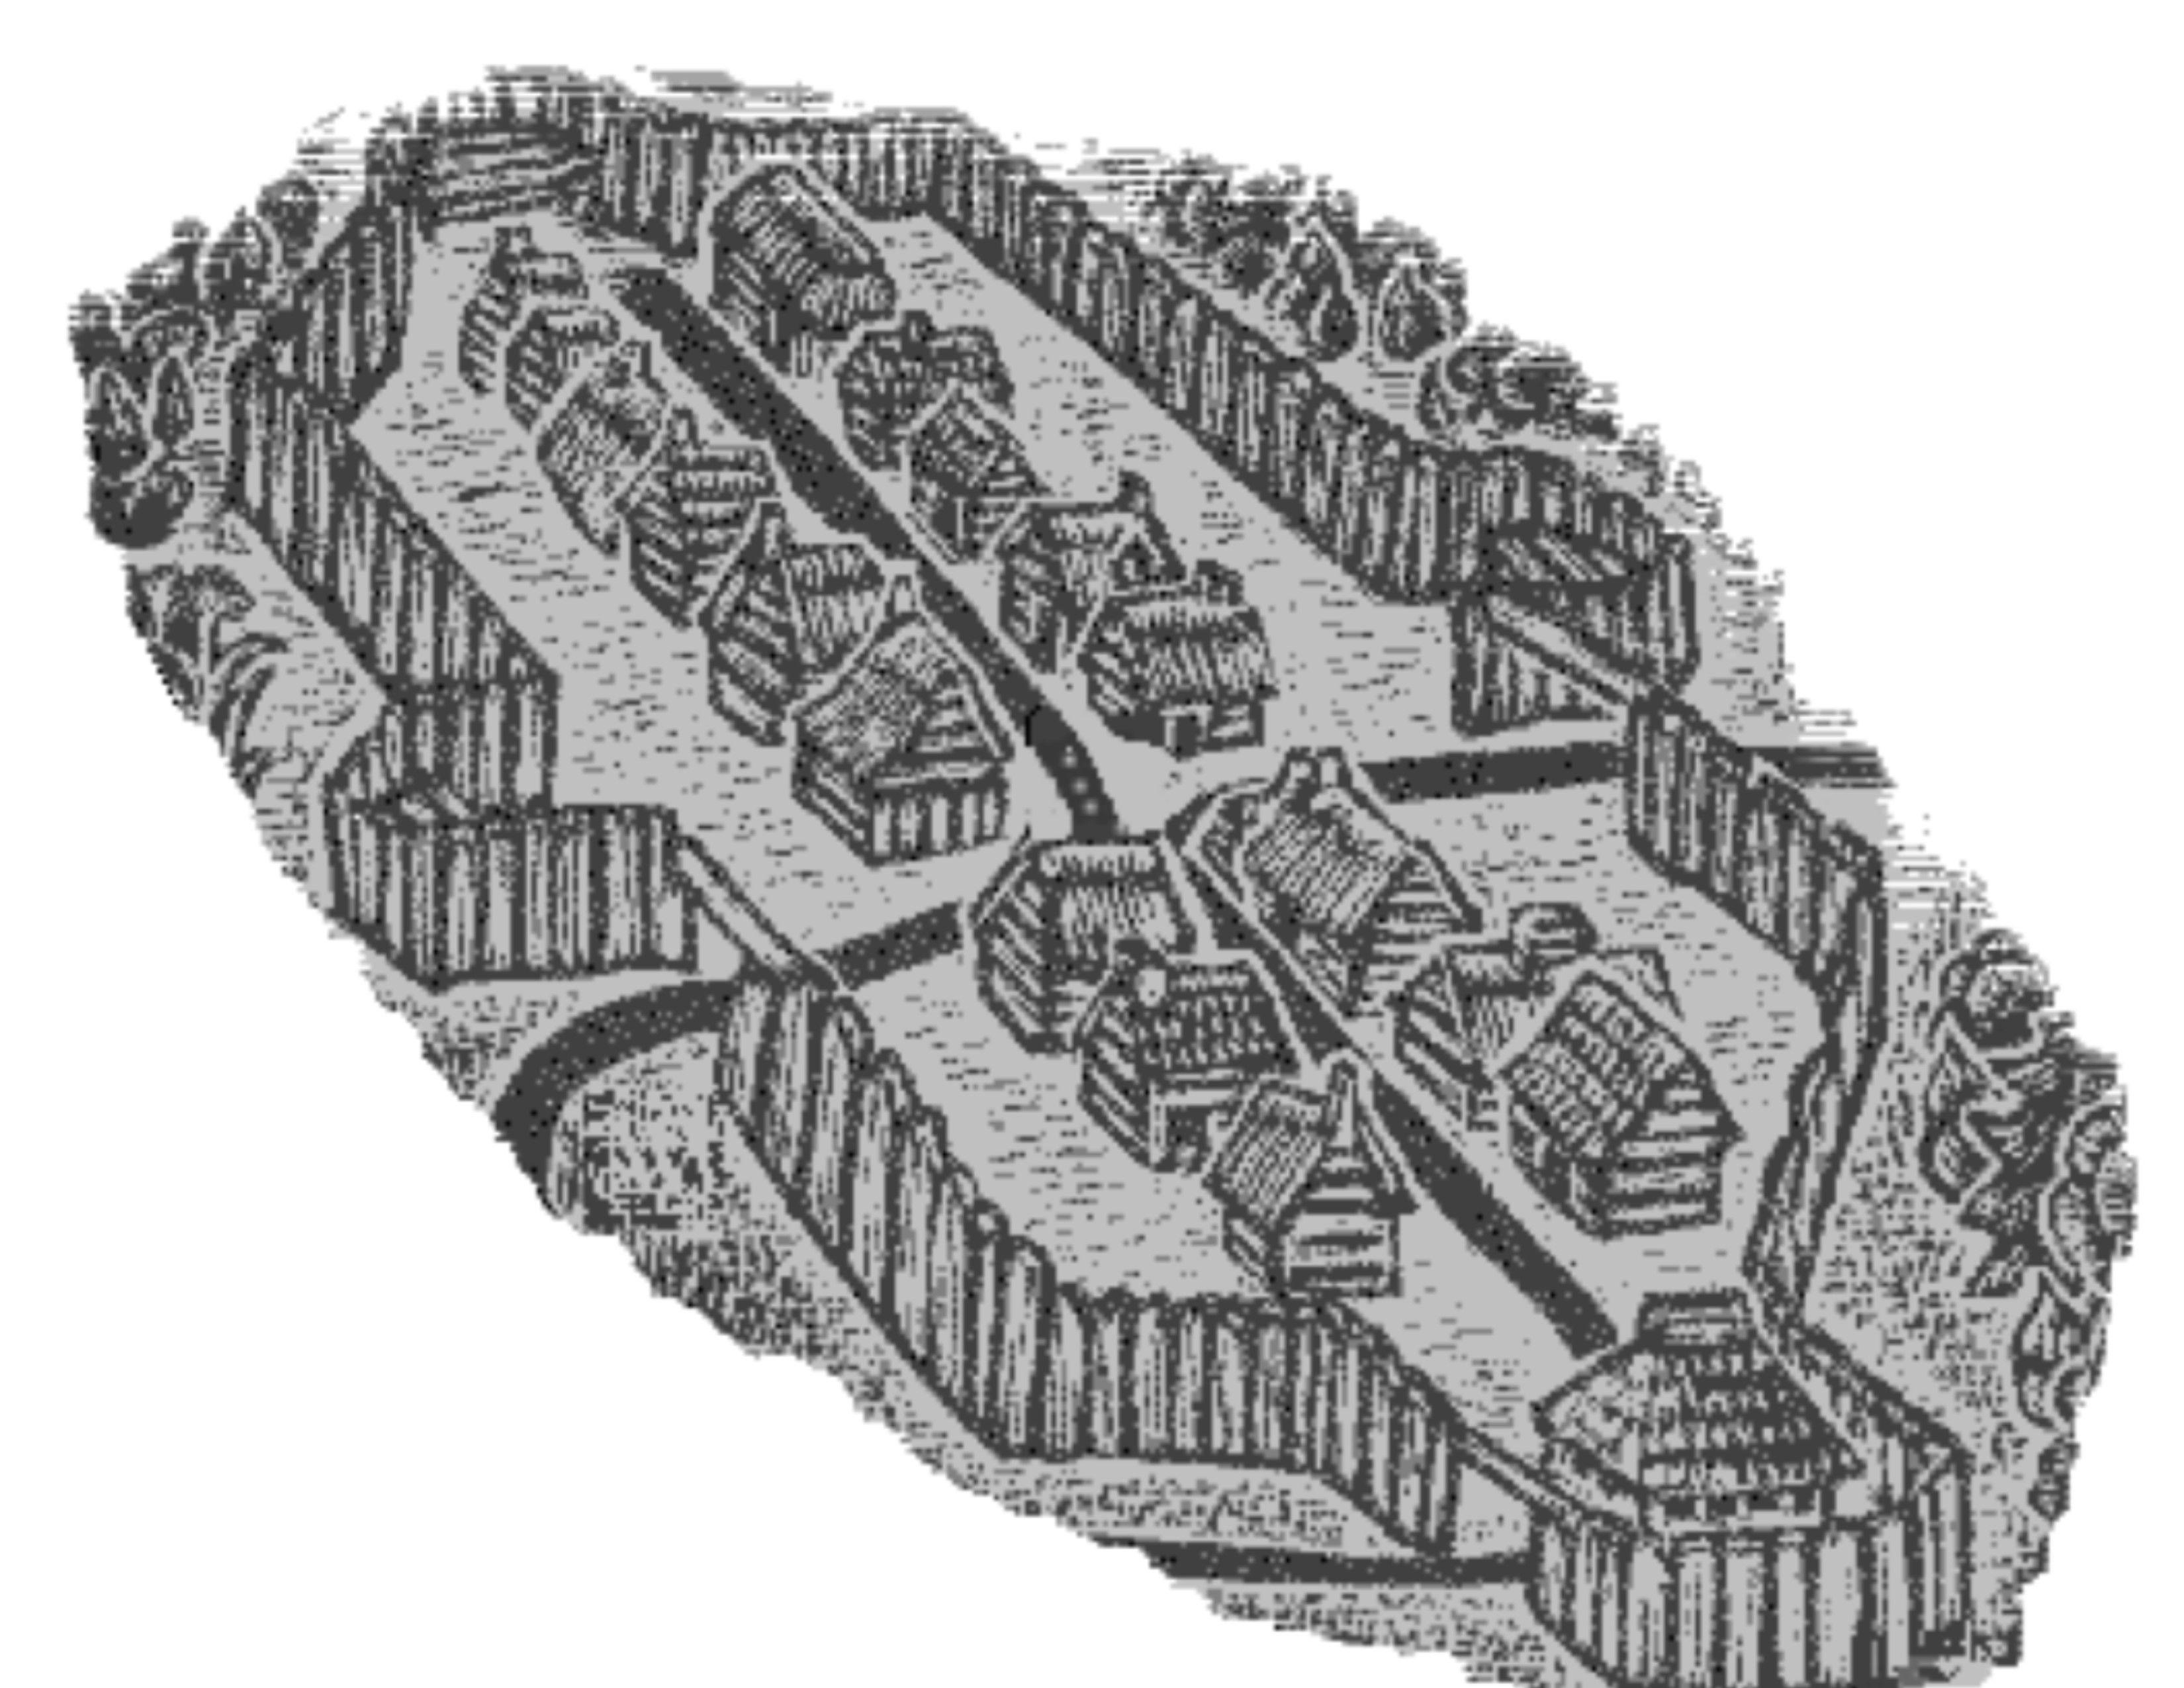 Pin on year 1620 Mayflower & passengers